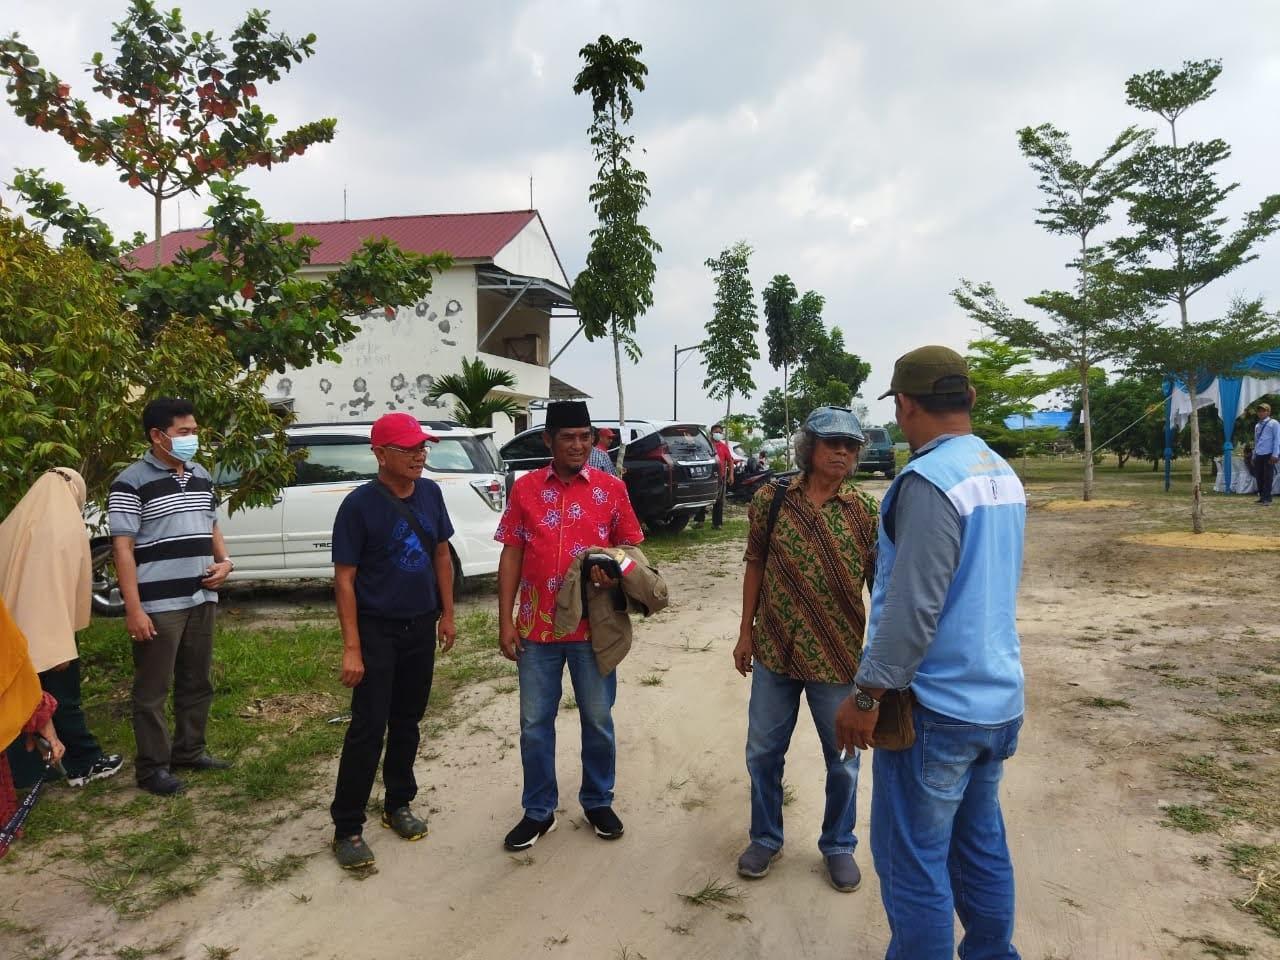 Alexander Pranoto Rayakan Imlek di Pusdiklat APPI di Jalan Uka Rimbo Panjang